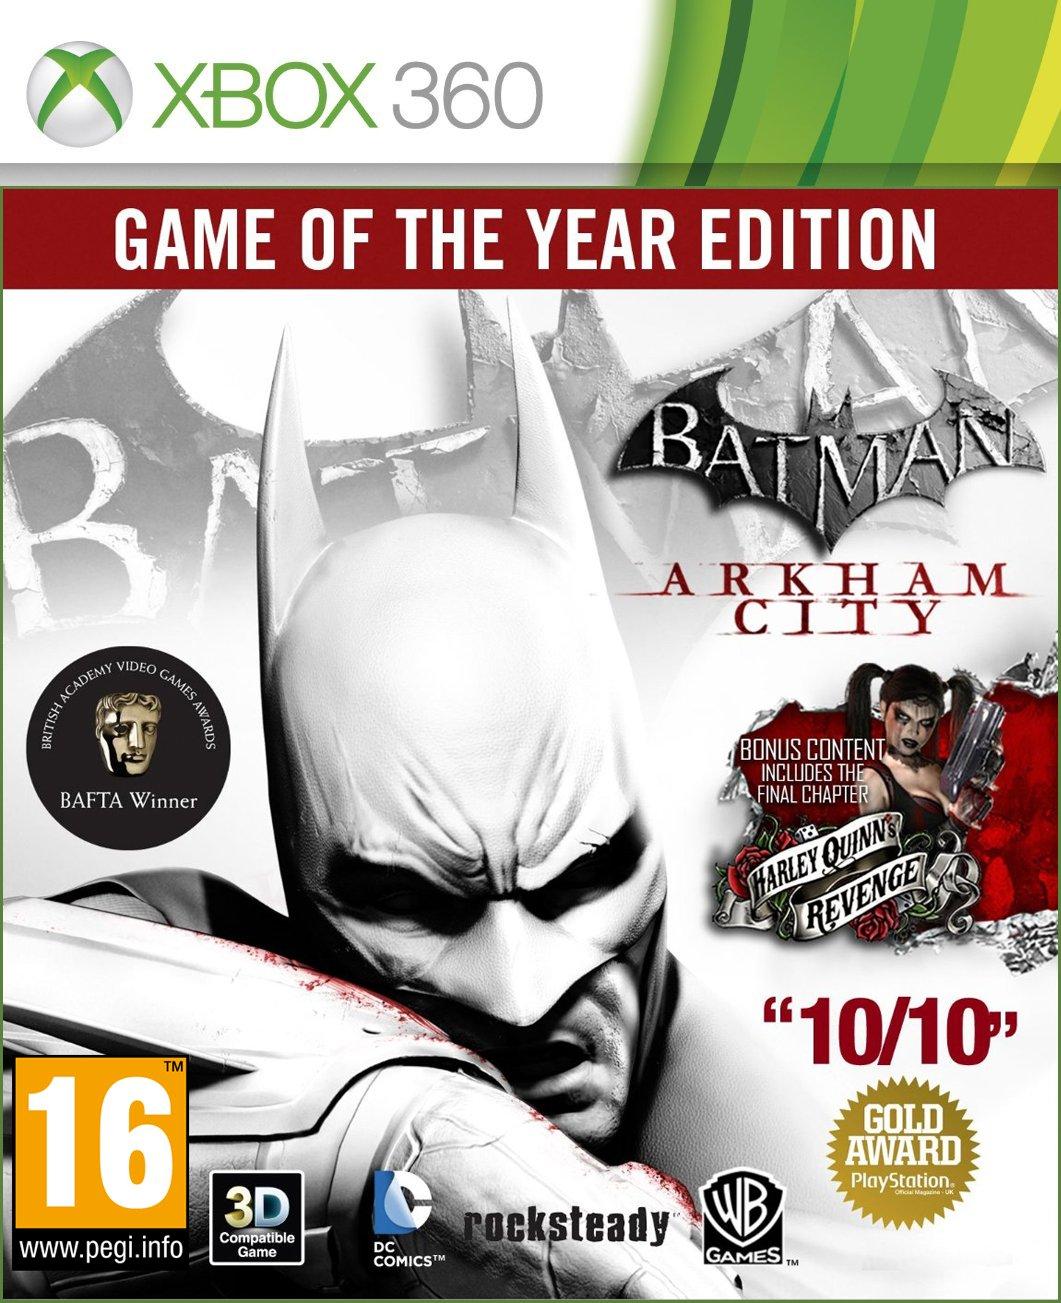 Original Xbox Games On Xbox 360 : Games xbox batman arkham city game of the year